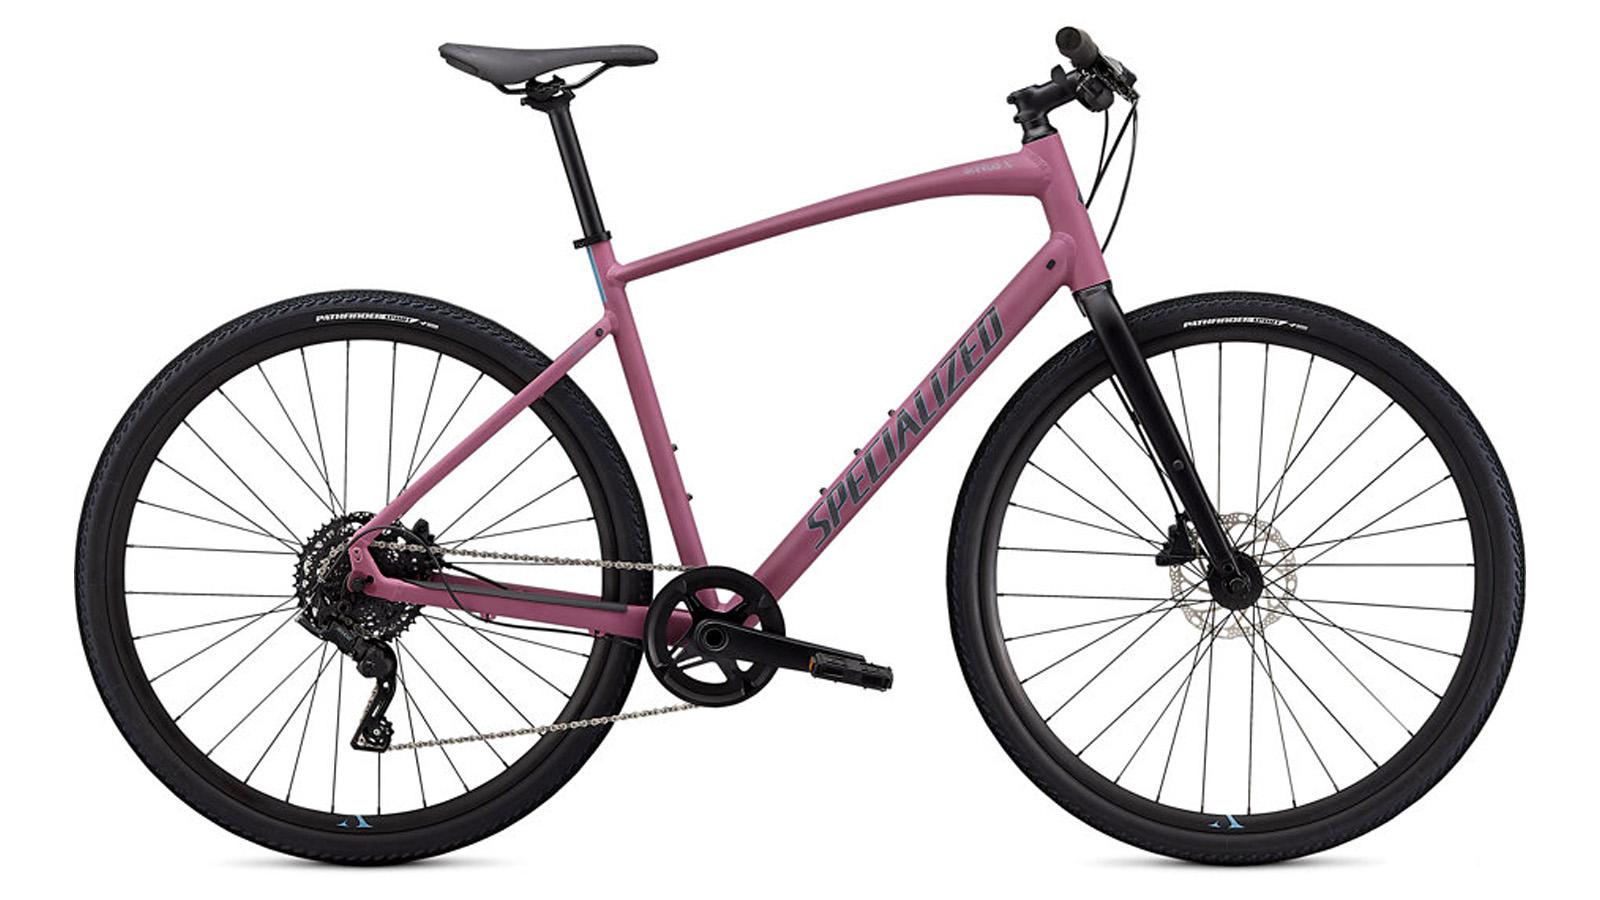 Best commuter bike: Specialized Sirrus X 3.0